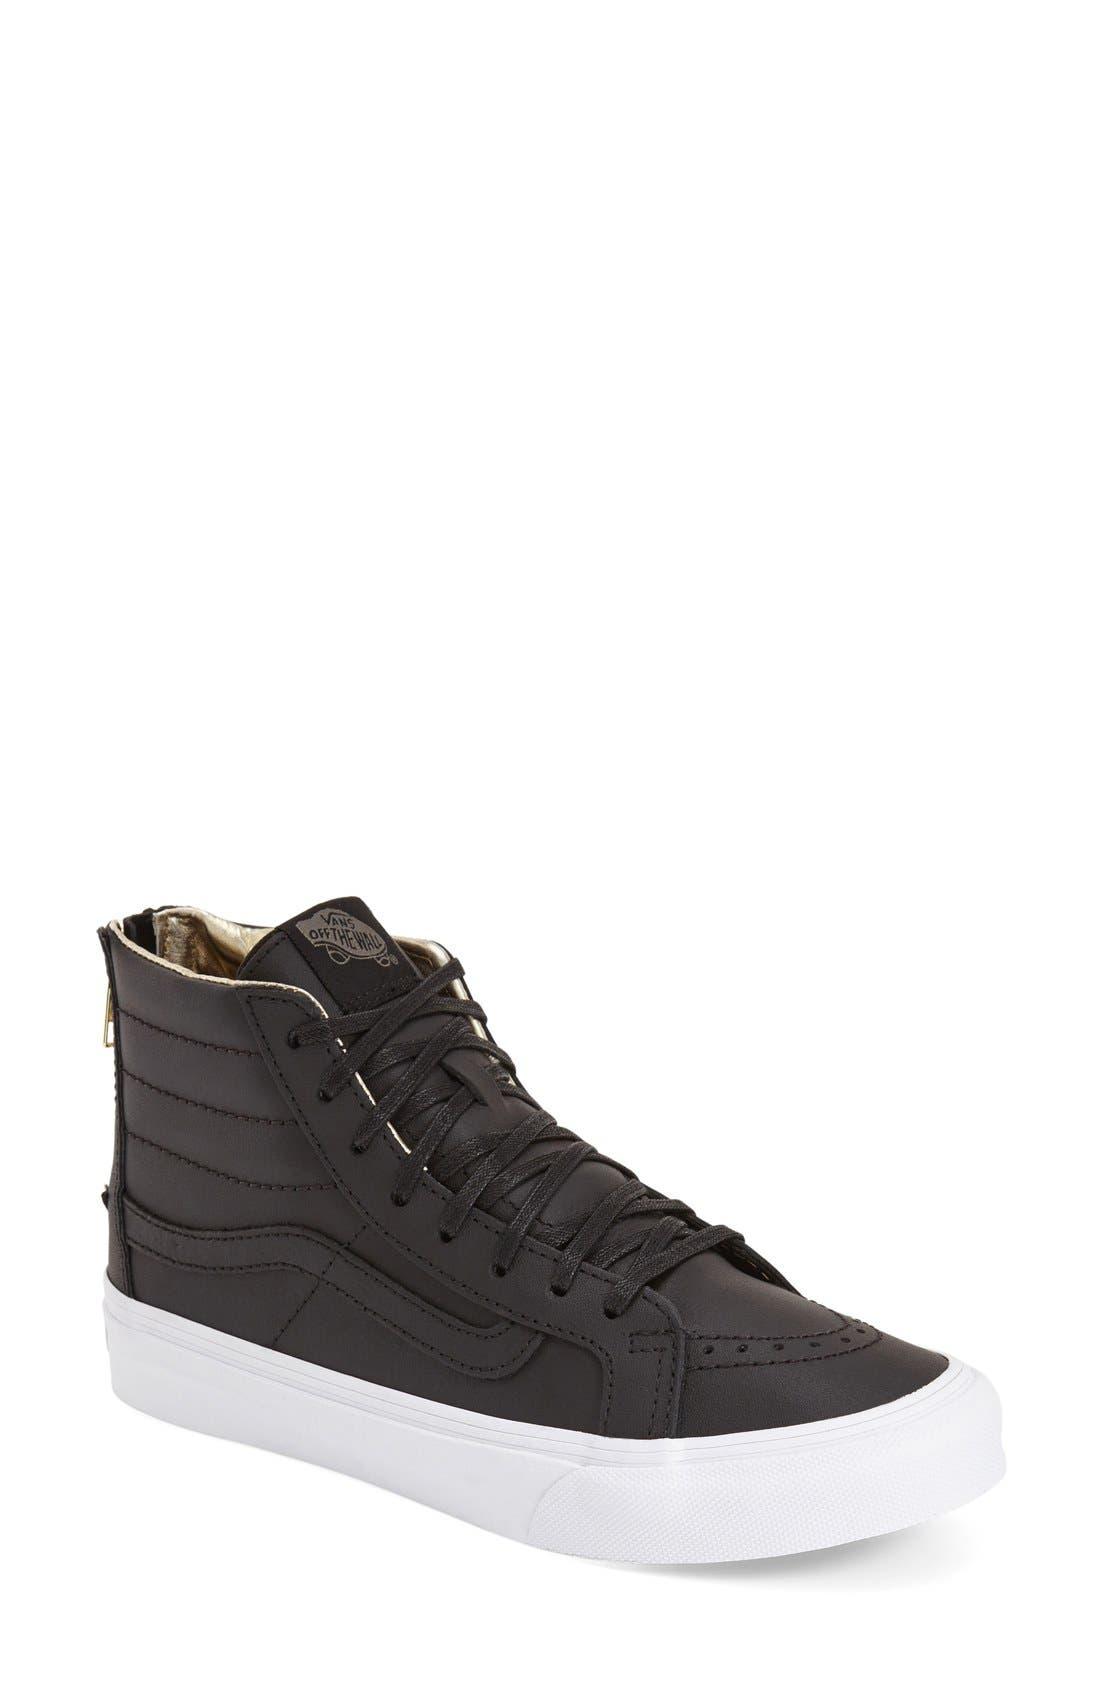 Alternate Image 1 Selected - Vans 'Sk8-Hi Slim' Zip Sneaker (Women)